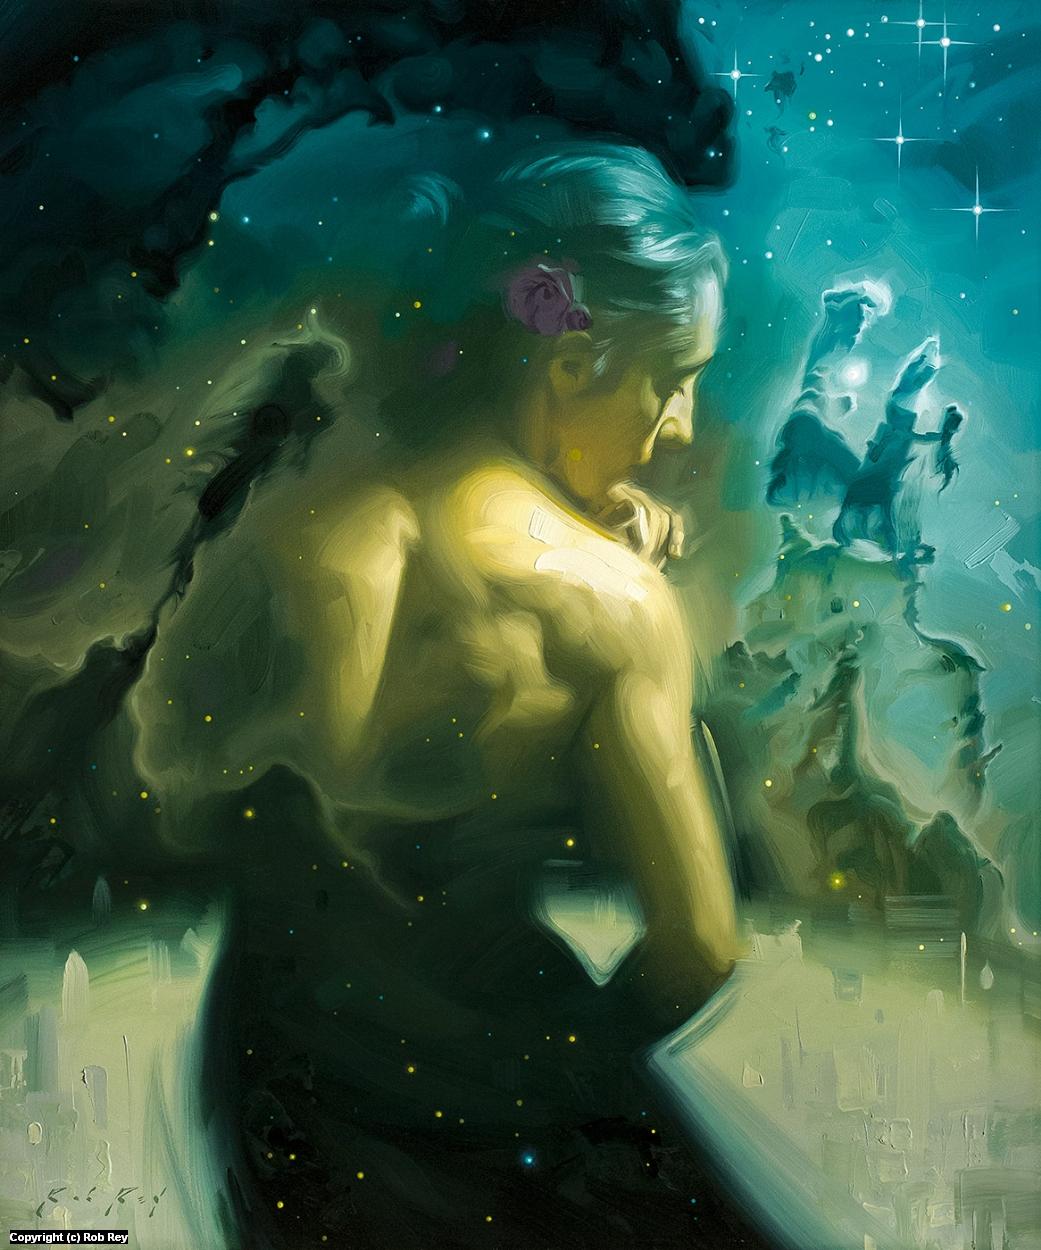 Stardust IV Artwork by Rob Rey